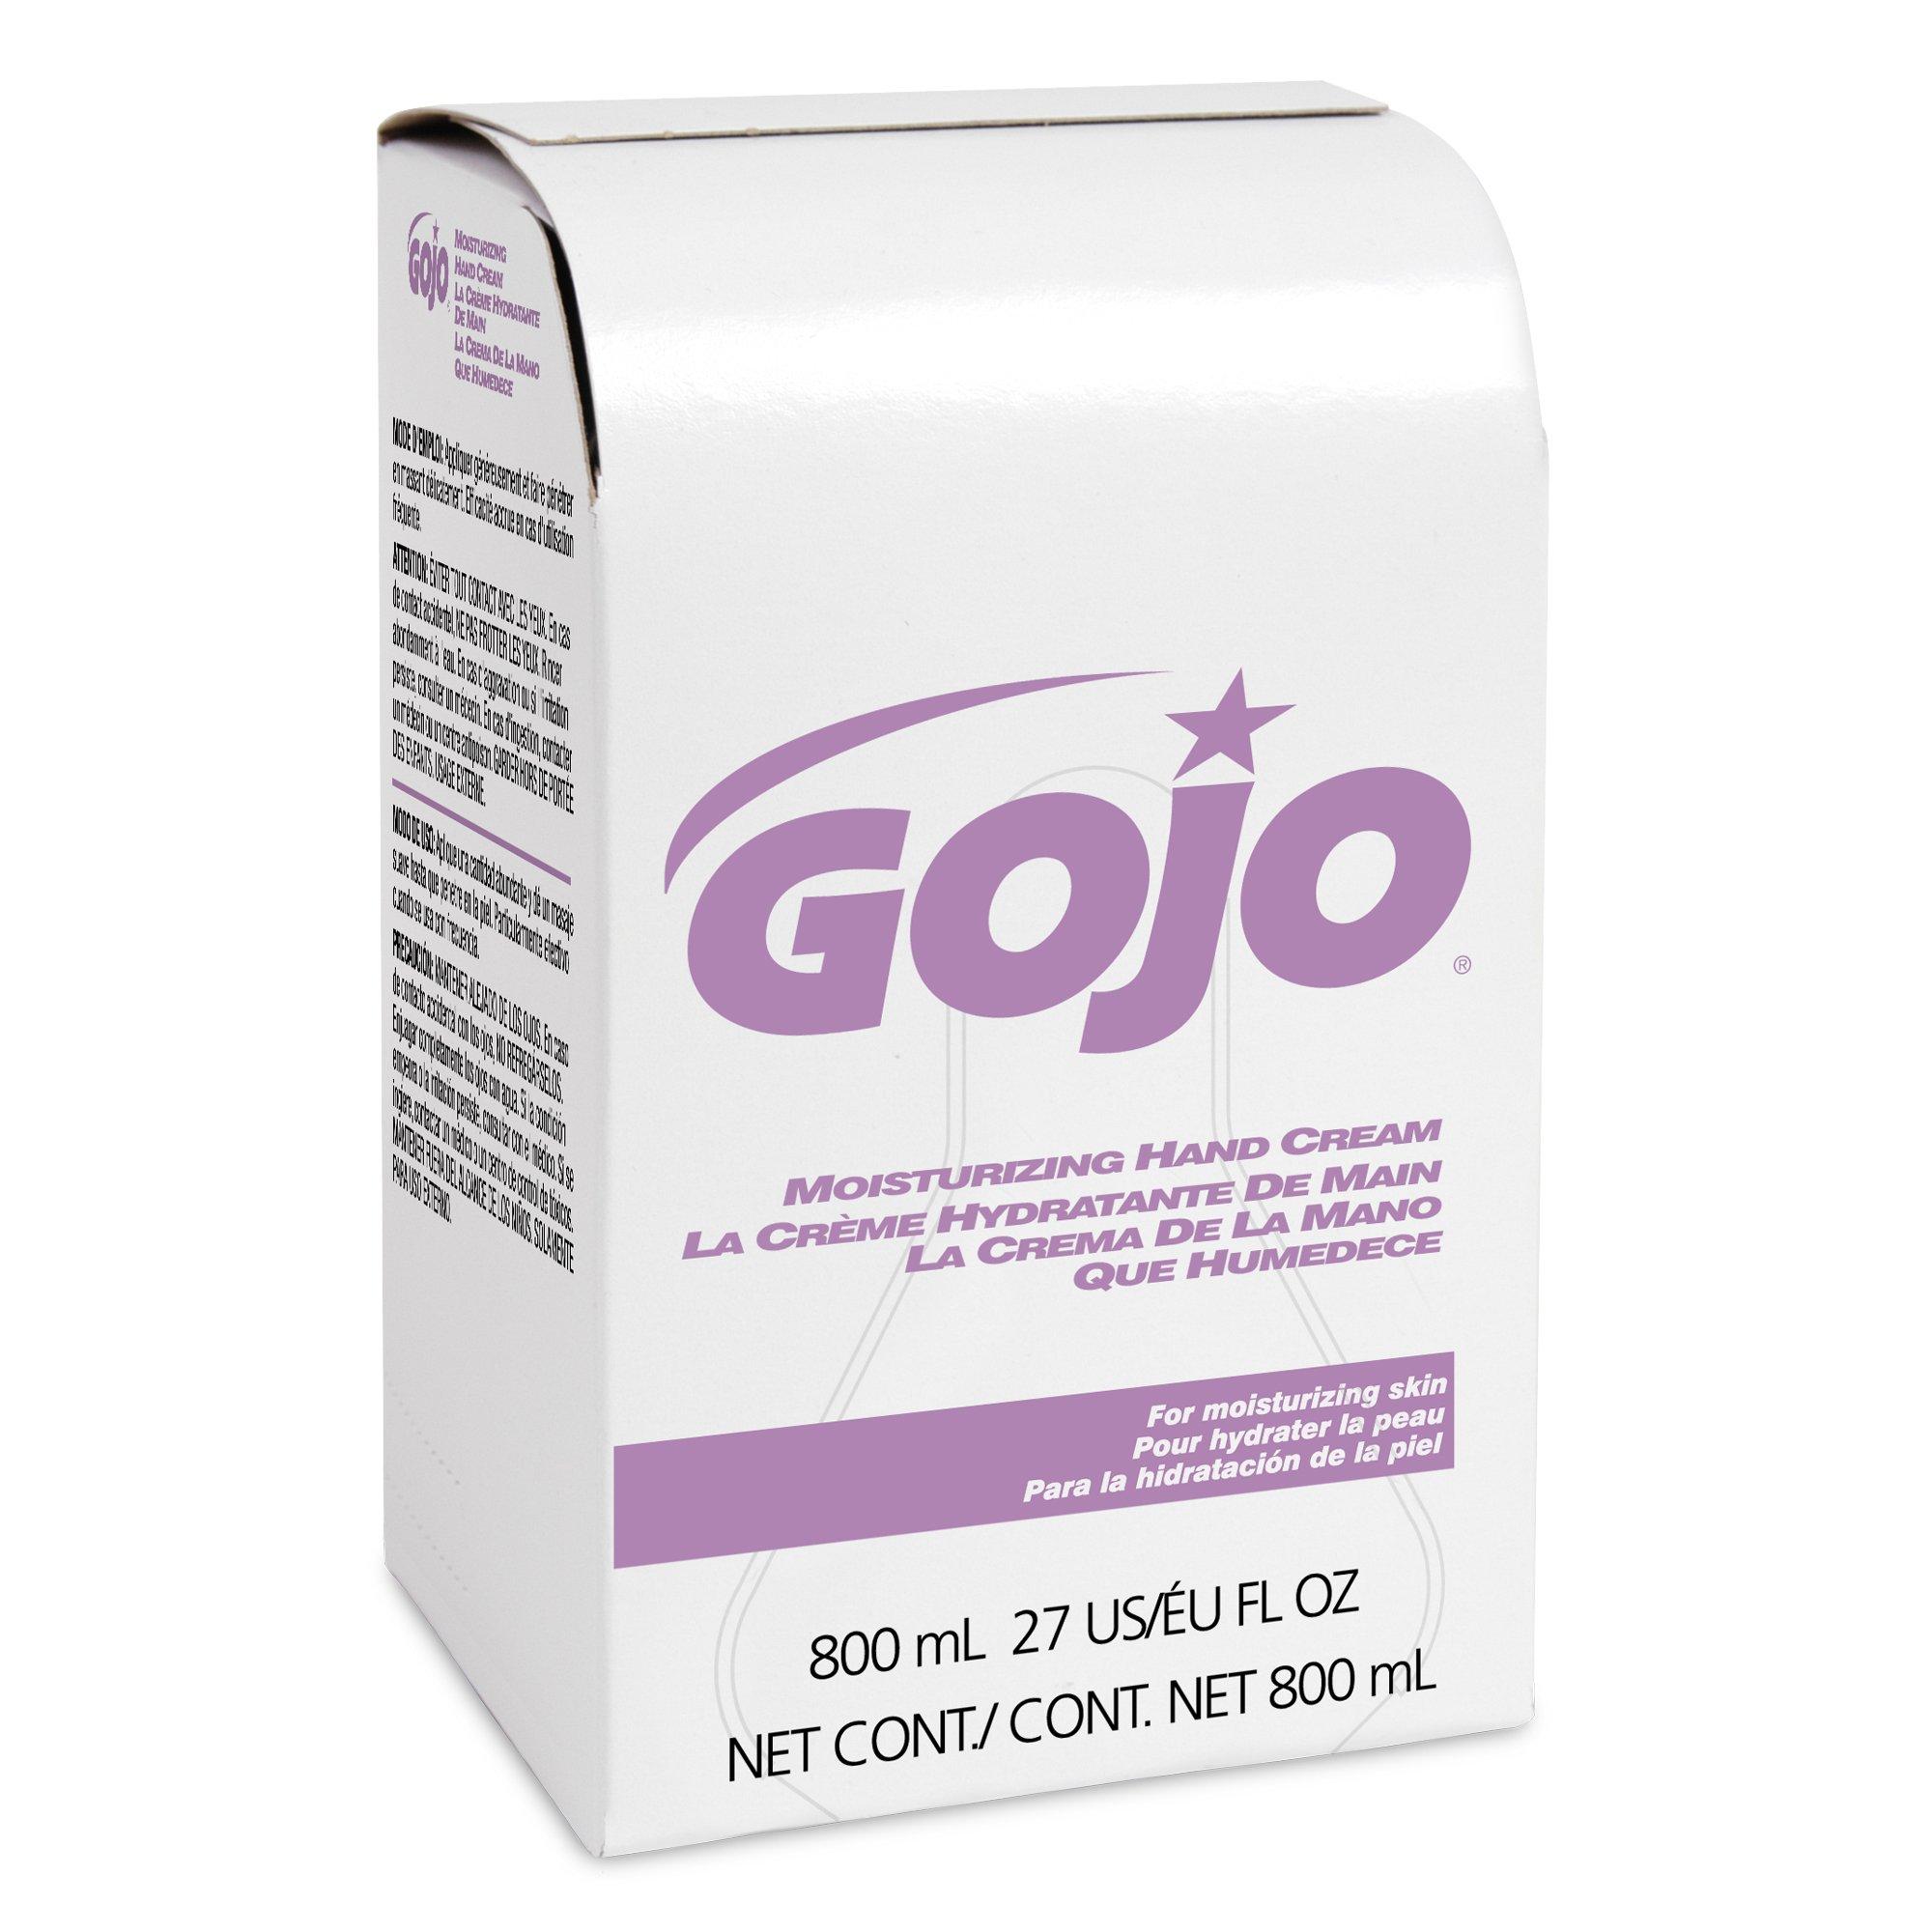 GOJO 9142-12 Moisturizing Hand Cream, 800 mL Refill (Pack of 12)